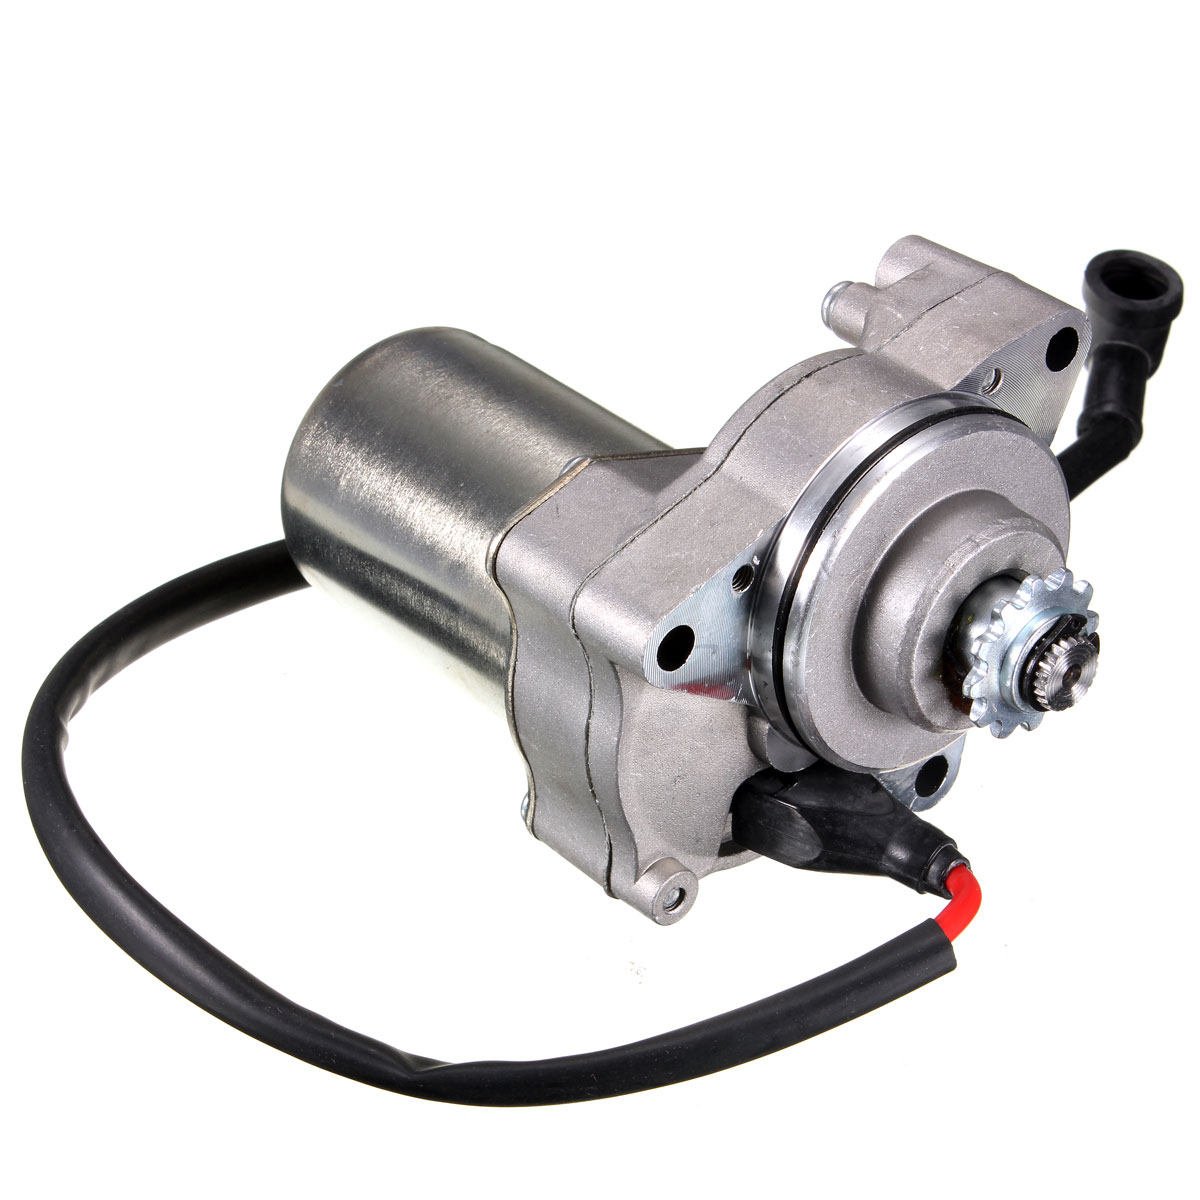 small resolution of 12v 48v 3 bolt motorbike atv electric starter motor for 50cc 90cc 110cc 4 stroke engine quad atv for honda kawasaki